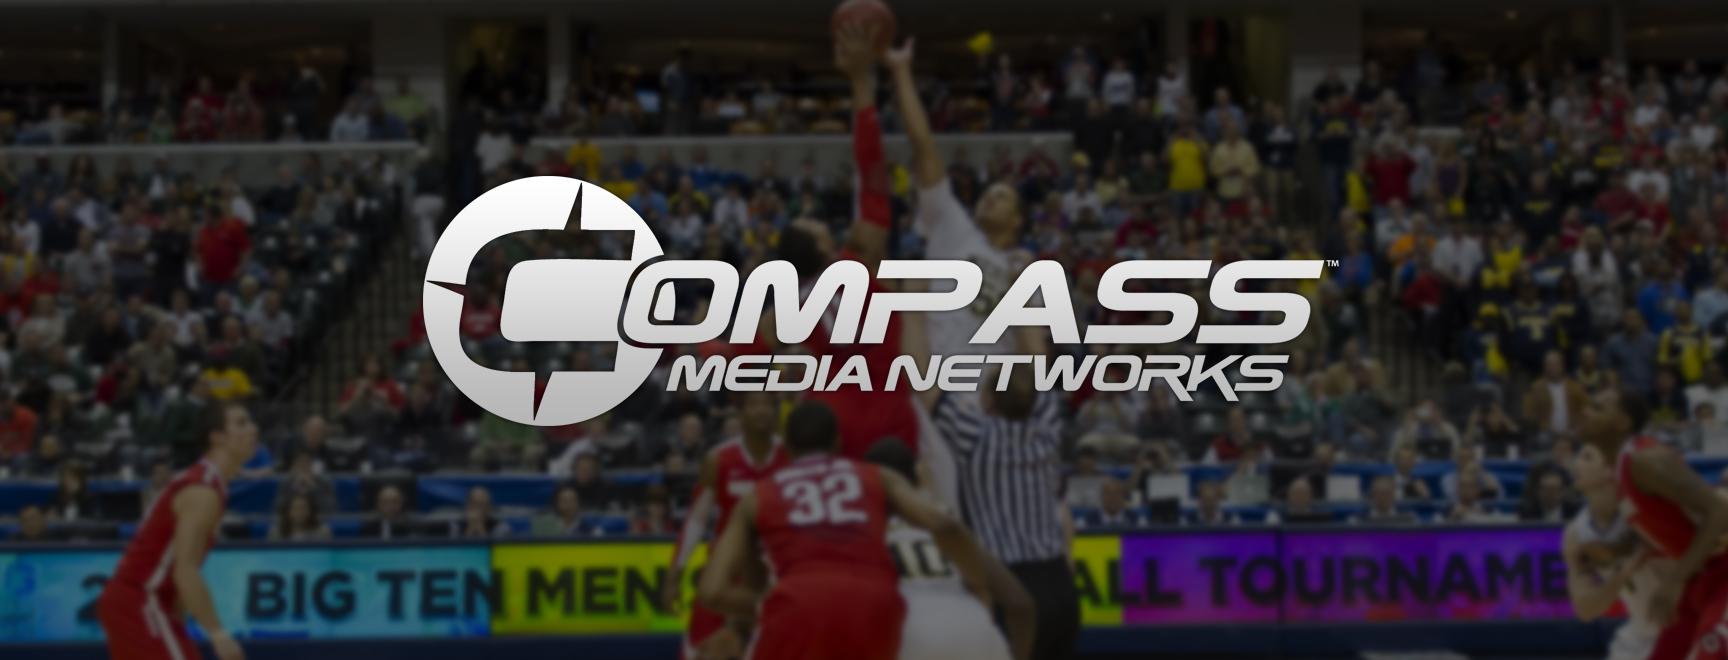 SportsPageHeaderbasketball